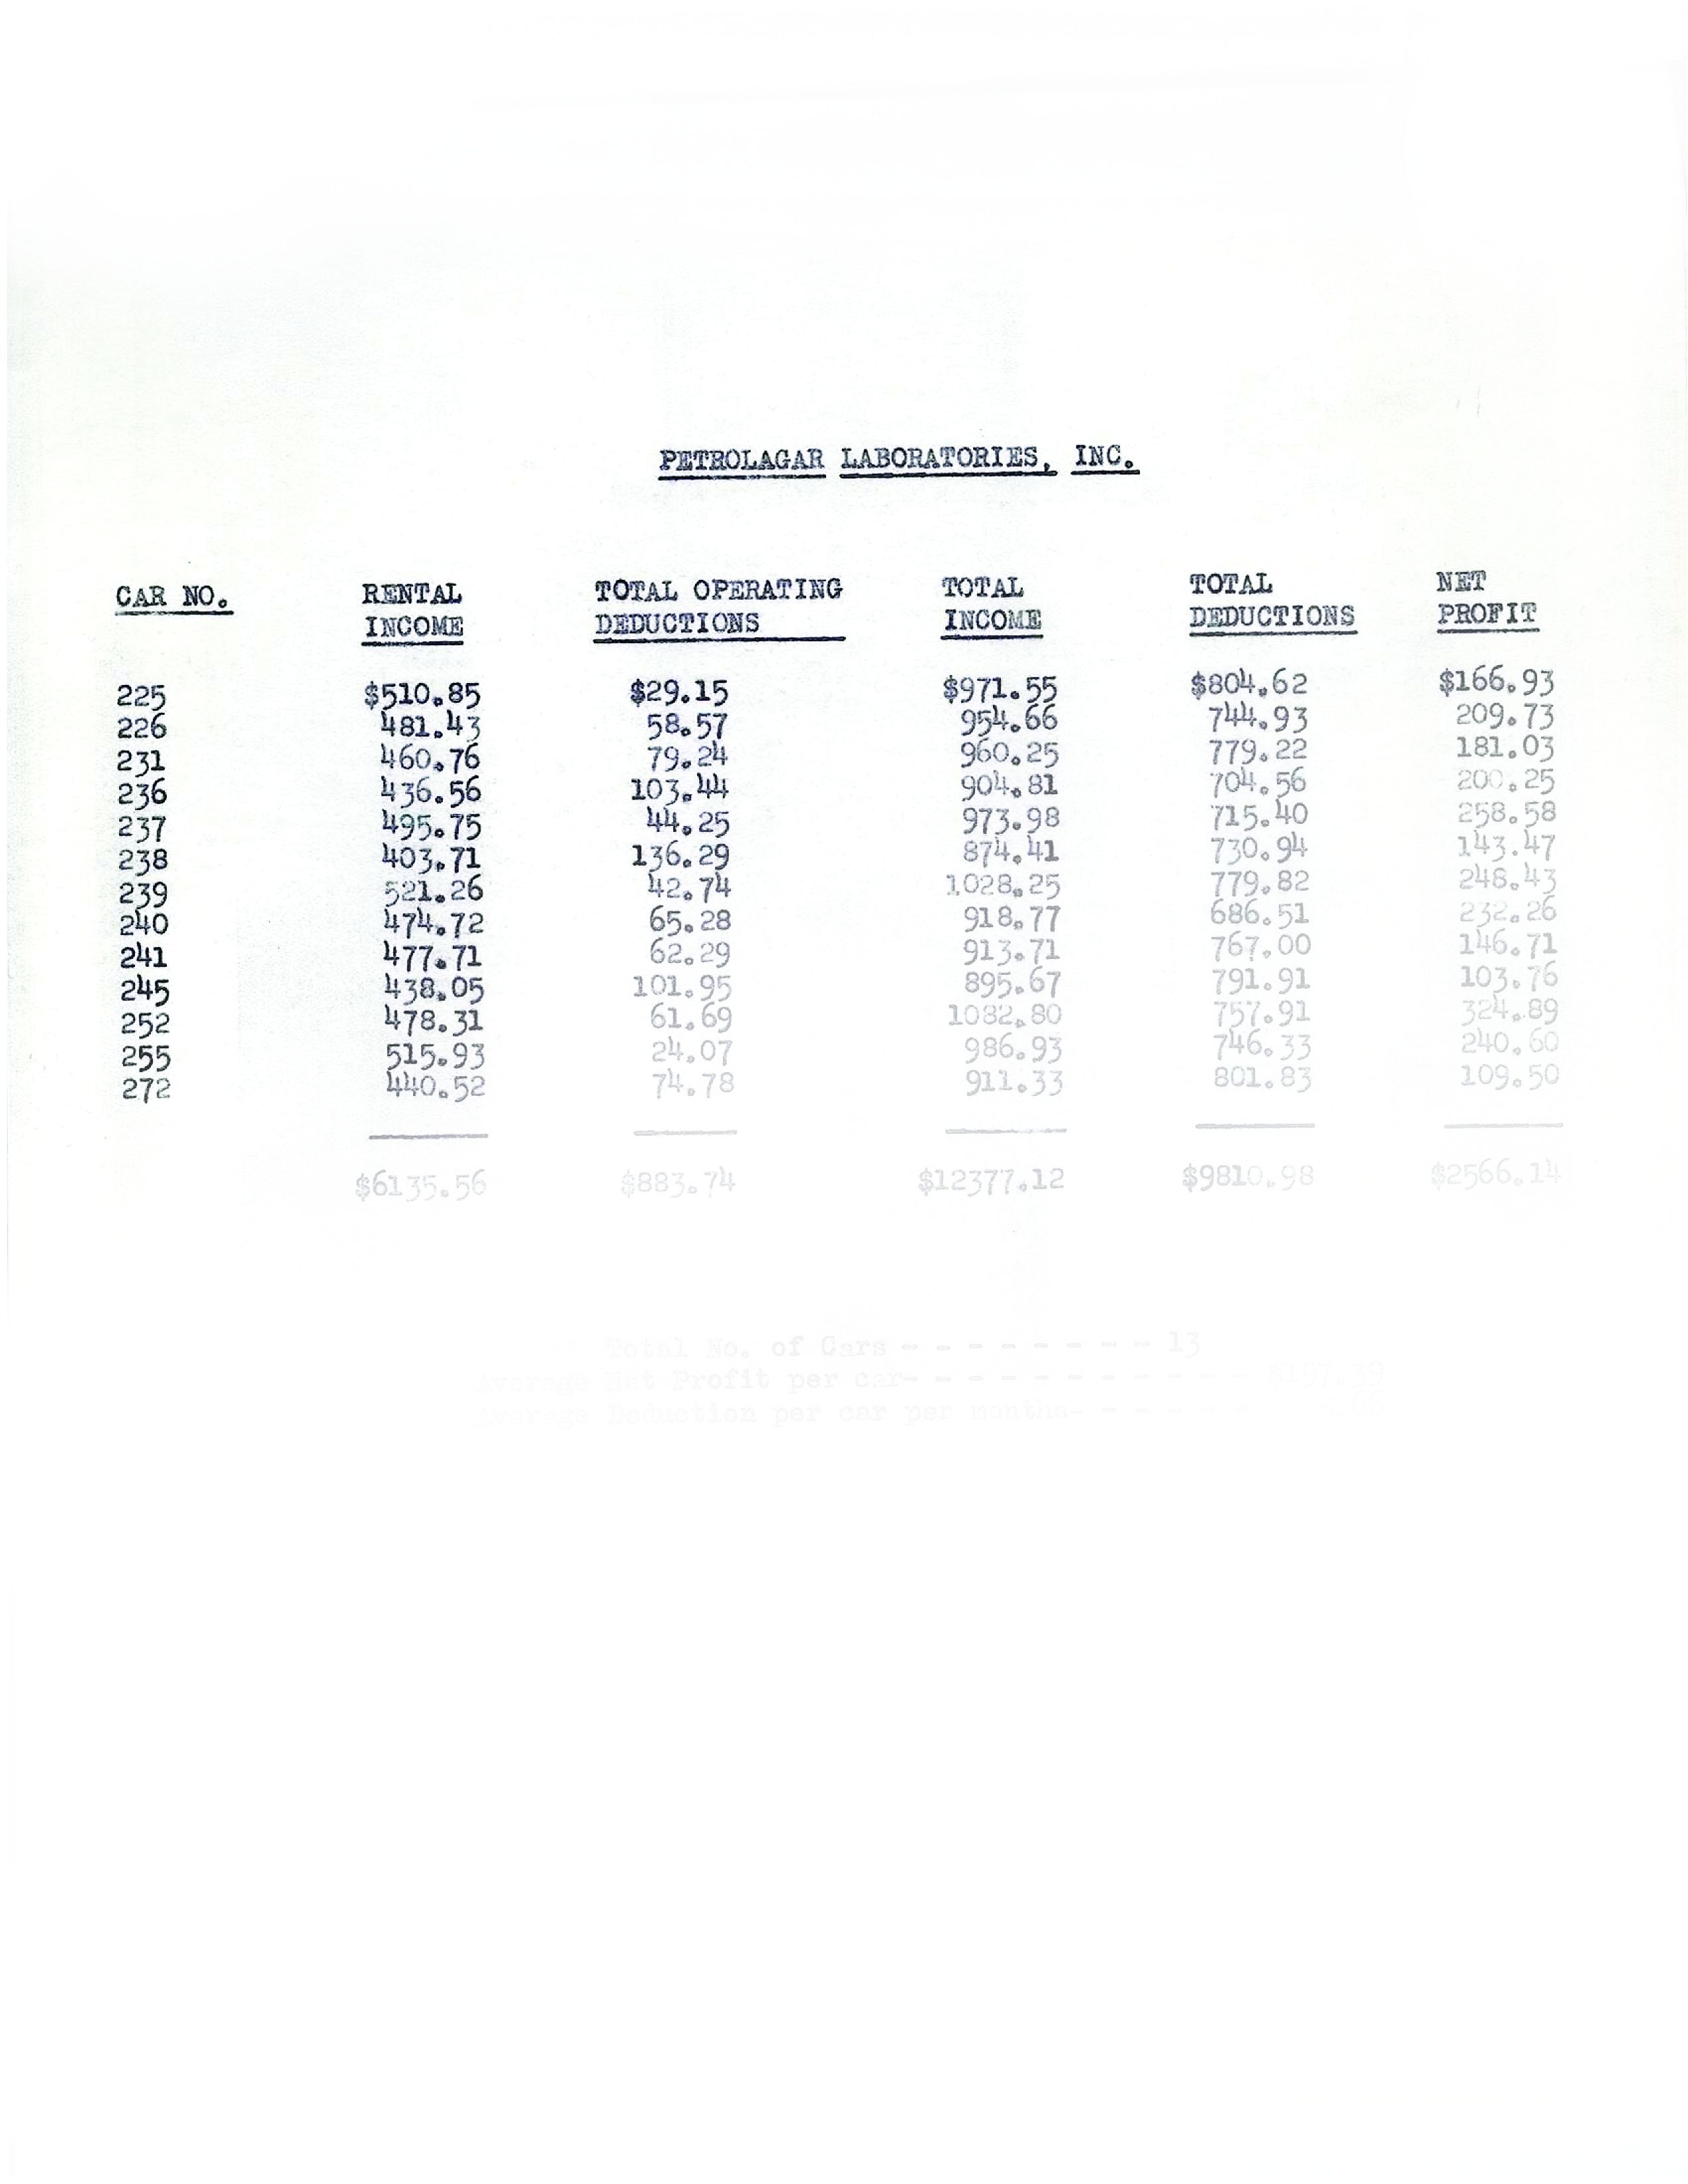 History of Fleet Leasing